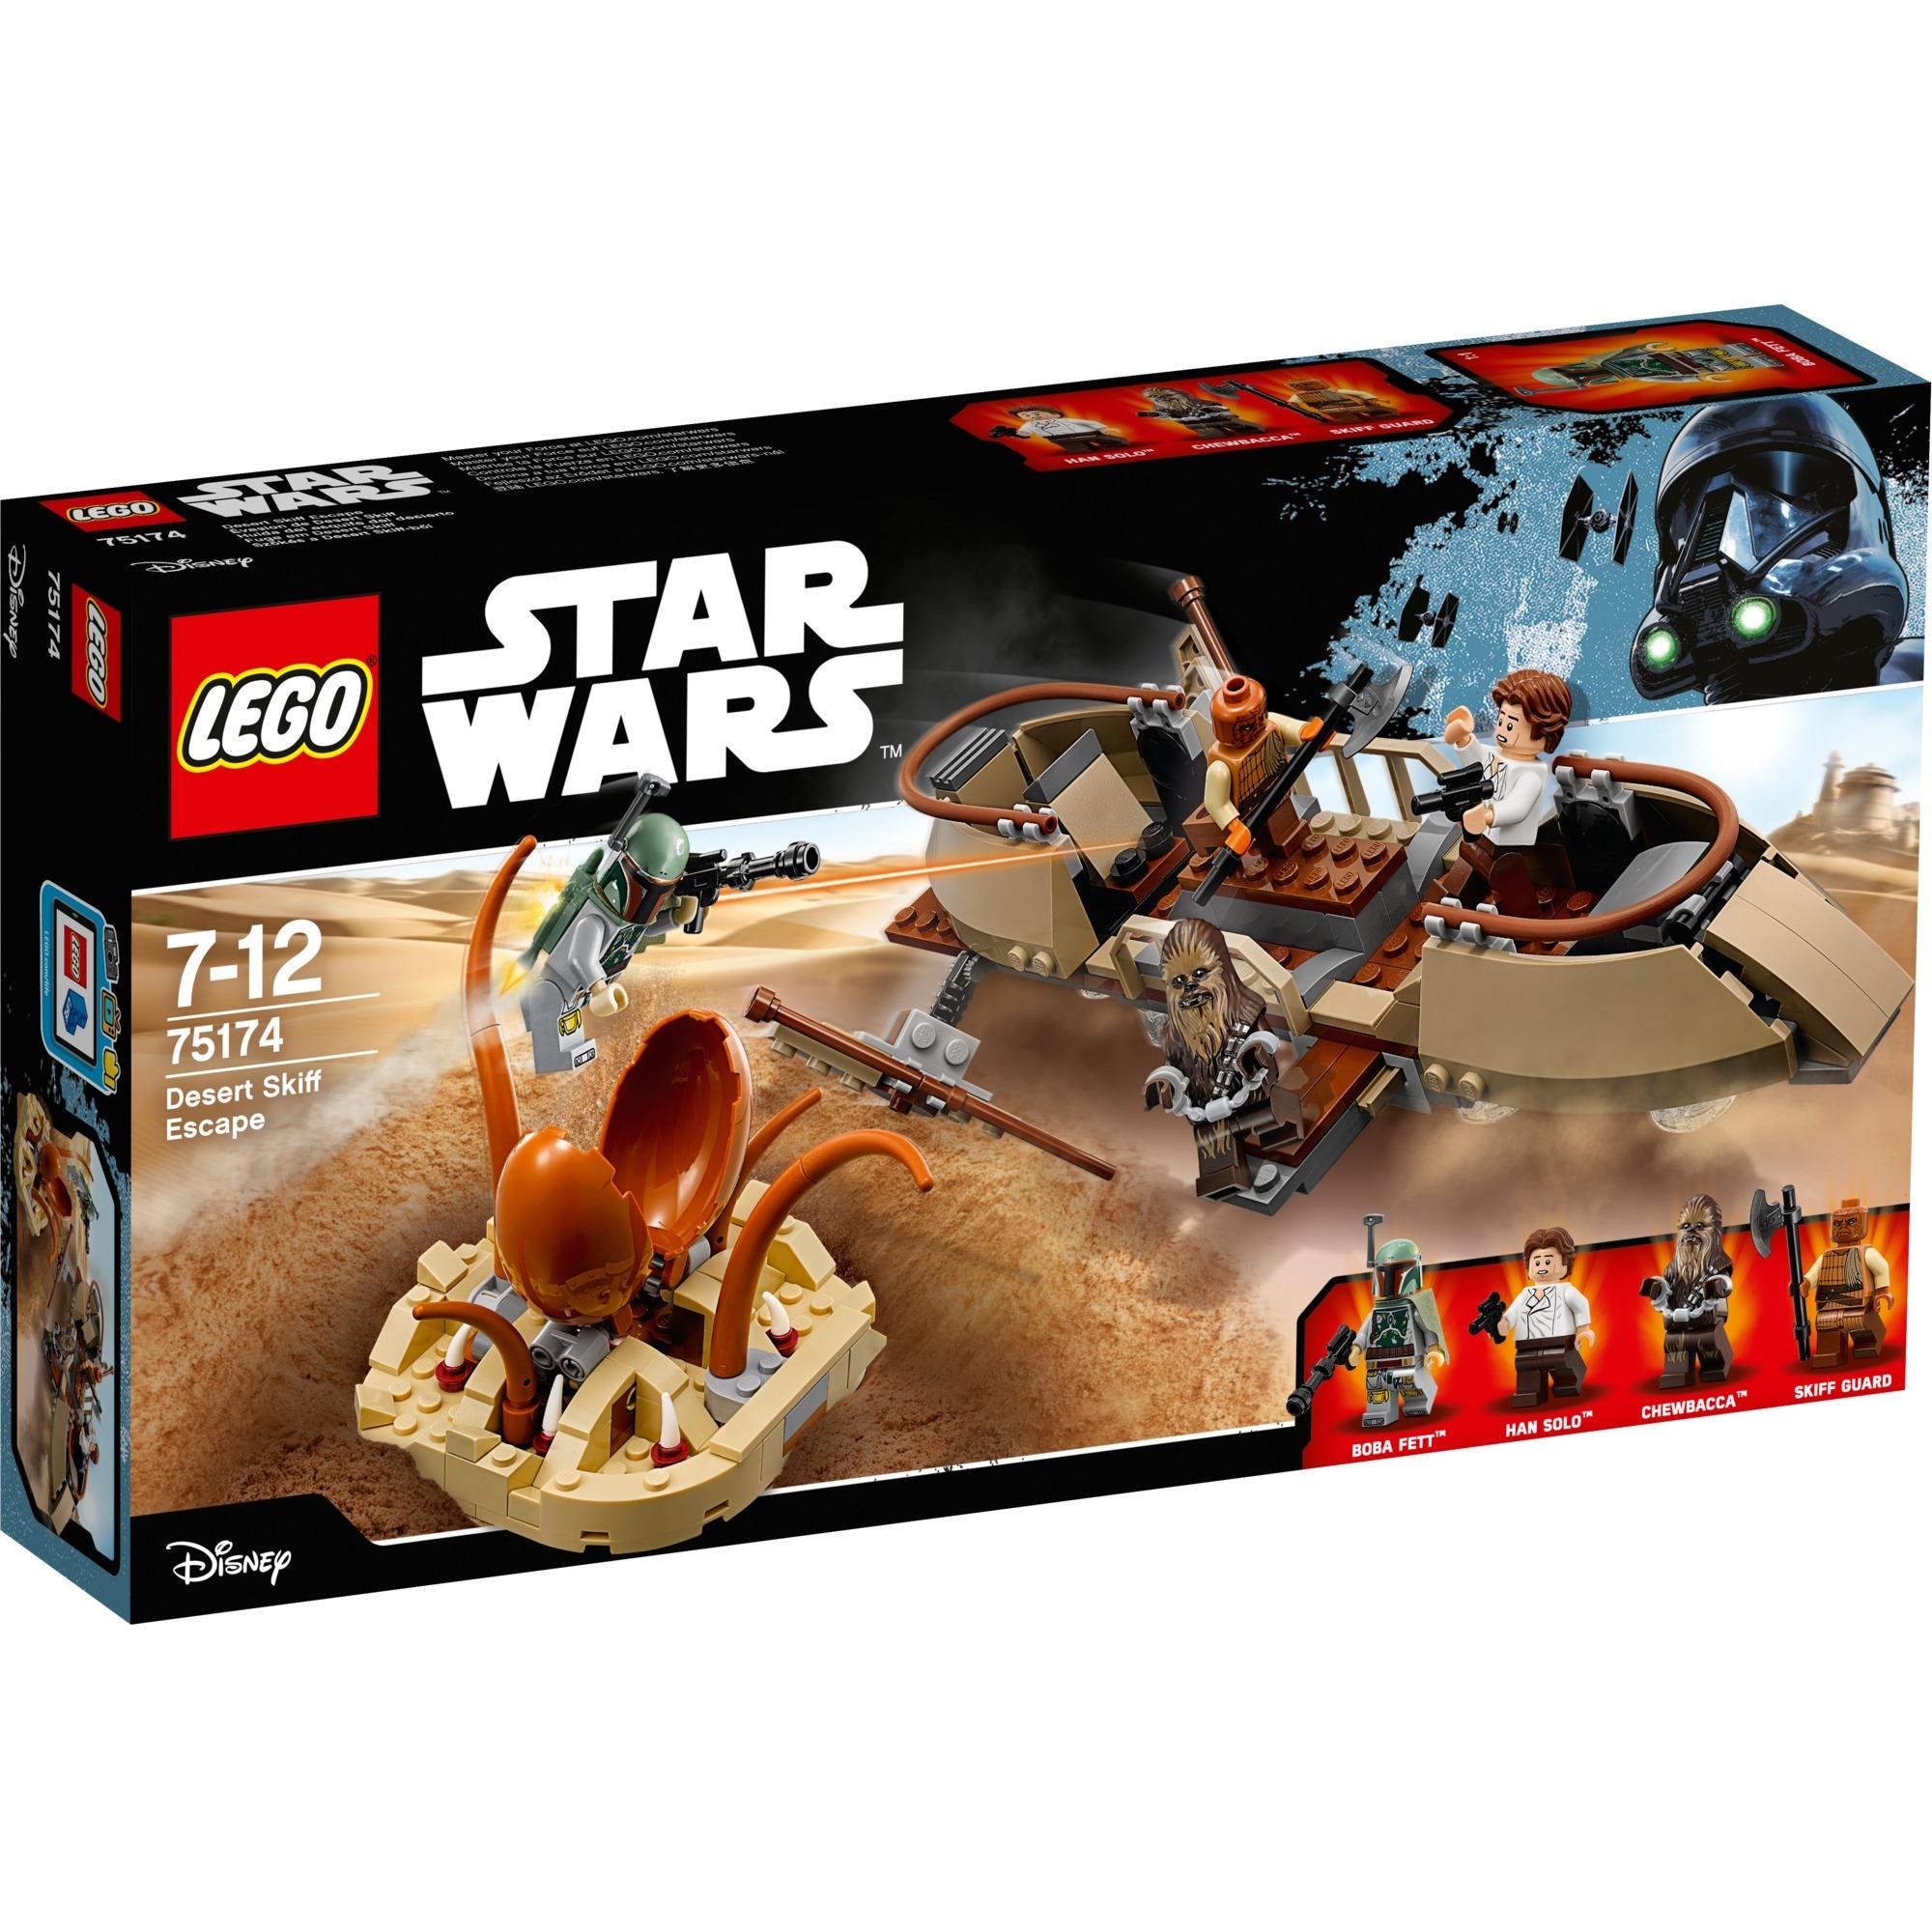 Star Wars - Évasion de Desert Skiff, Jouets de construction